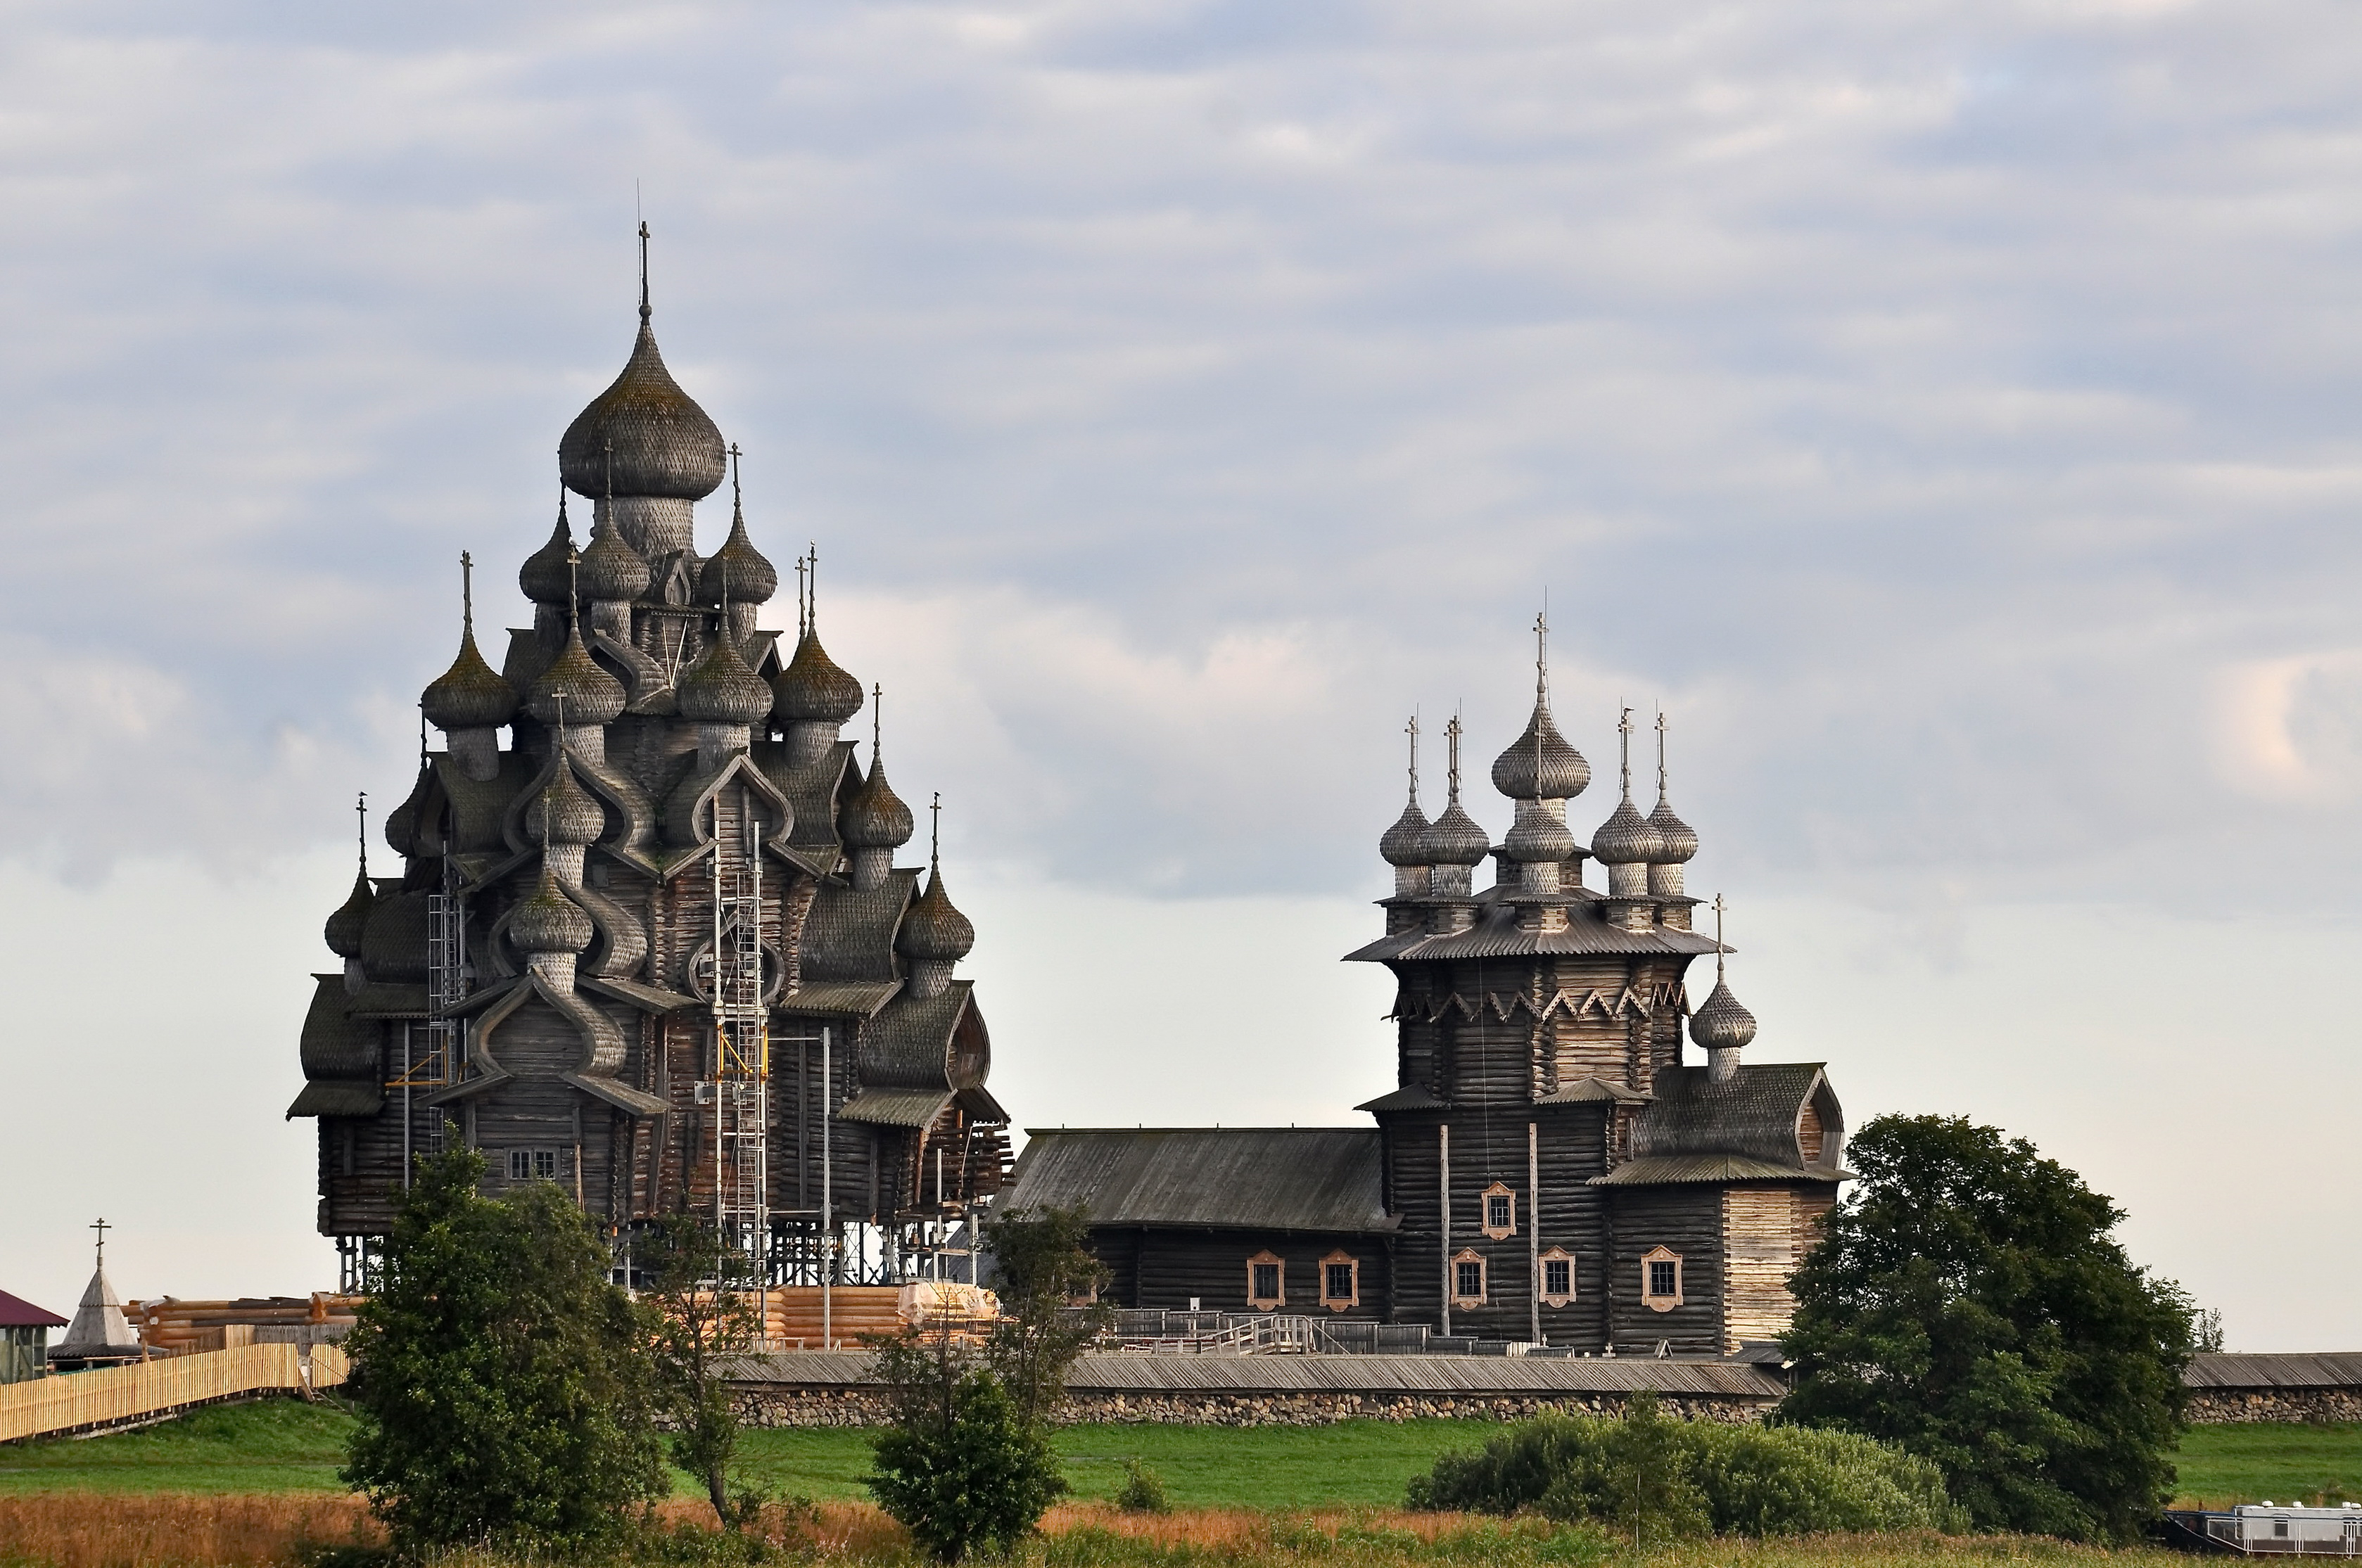 Karelian wooden architecture.